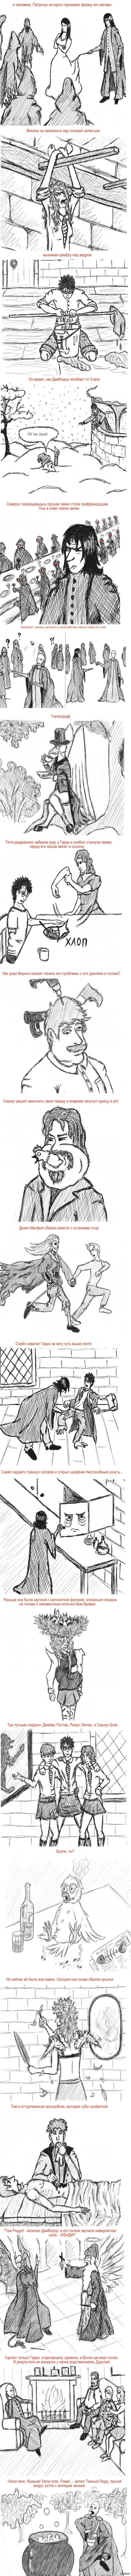 http://s.pikabu.ru/post_img/2013/09/06/11/1378489910_506413161.jpg